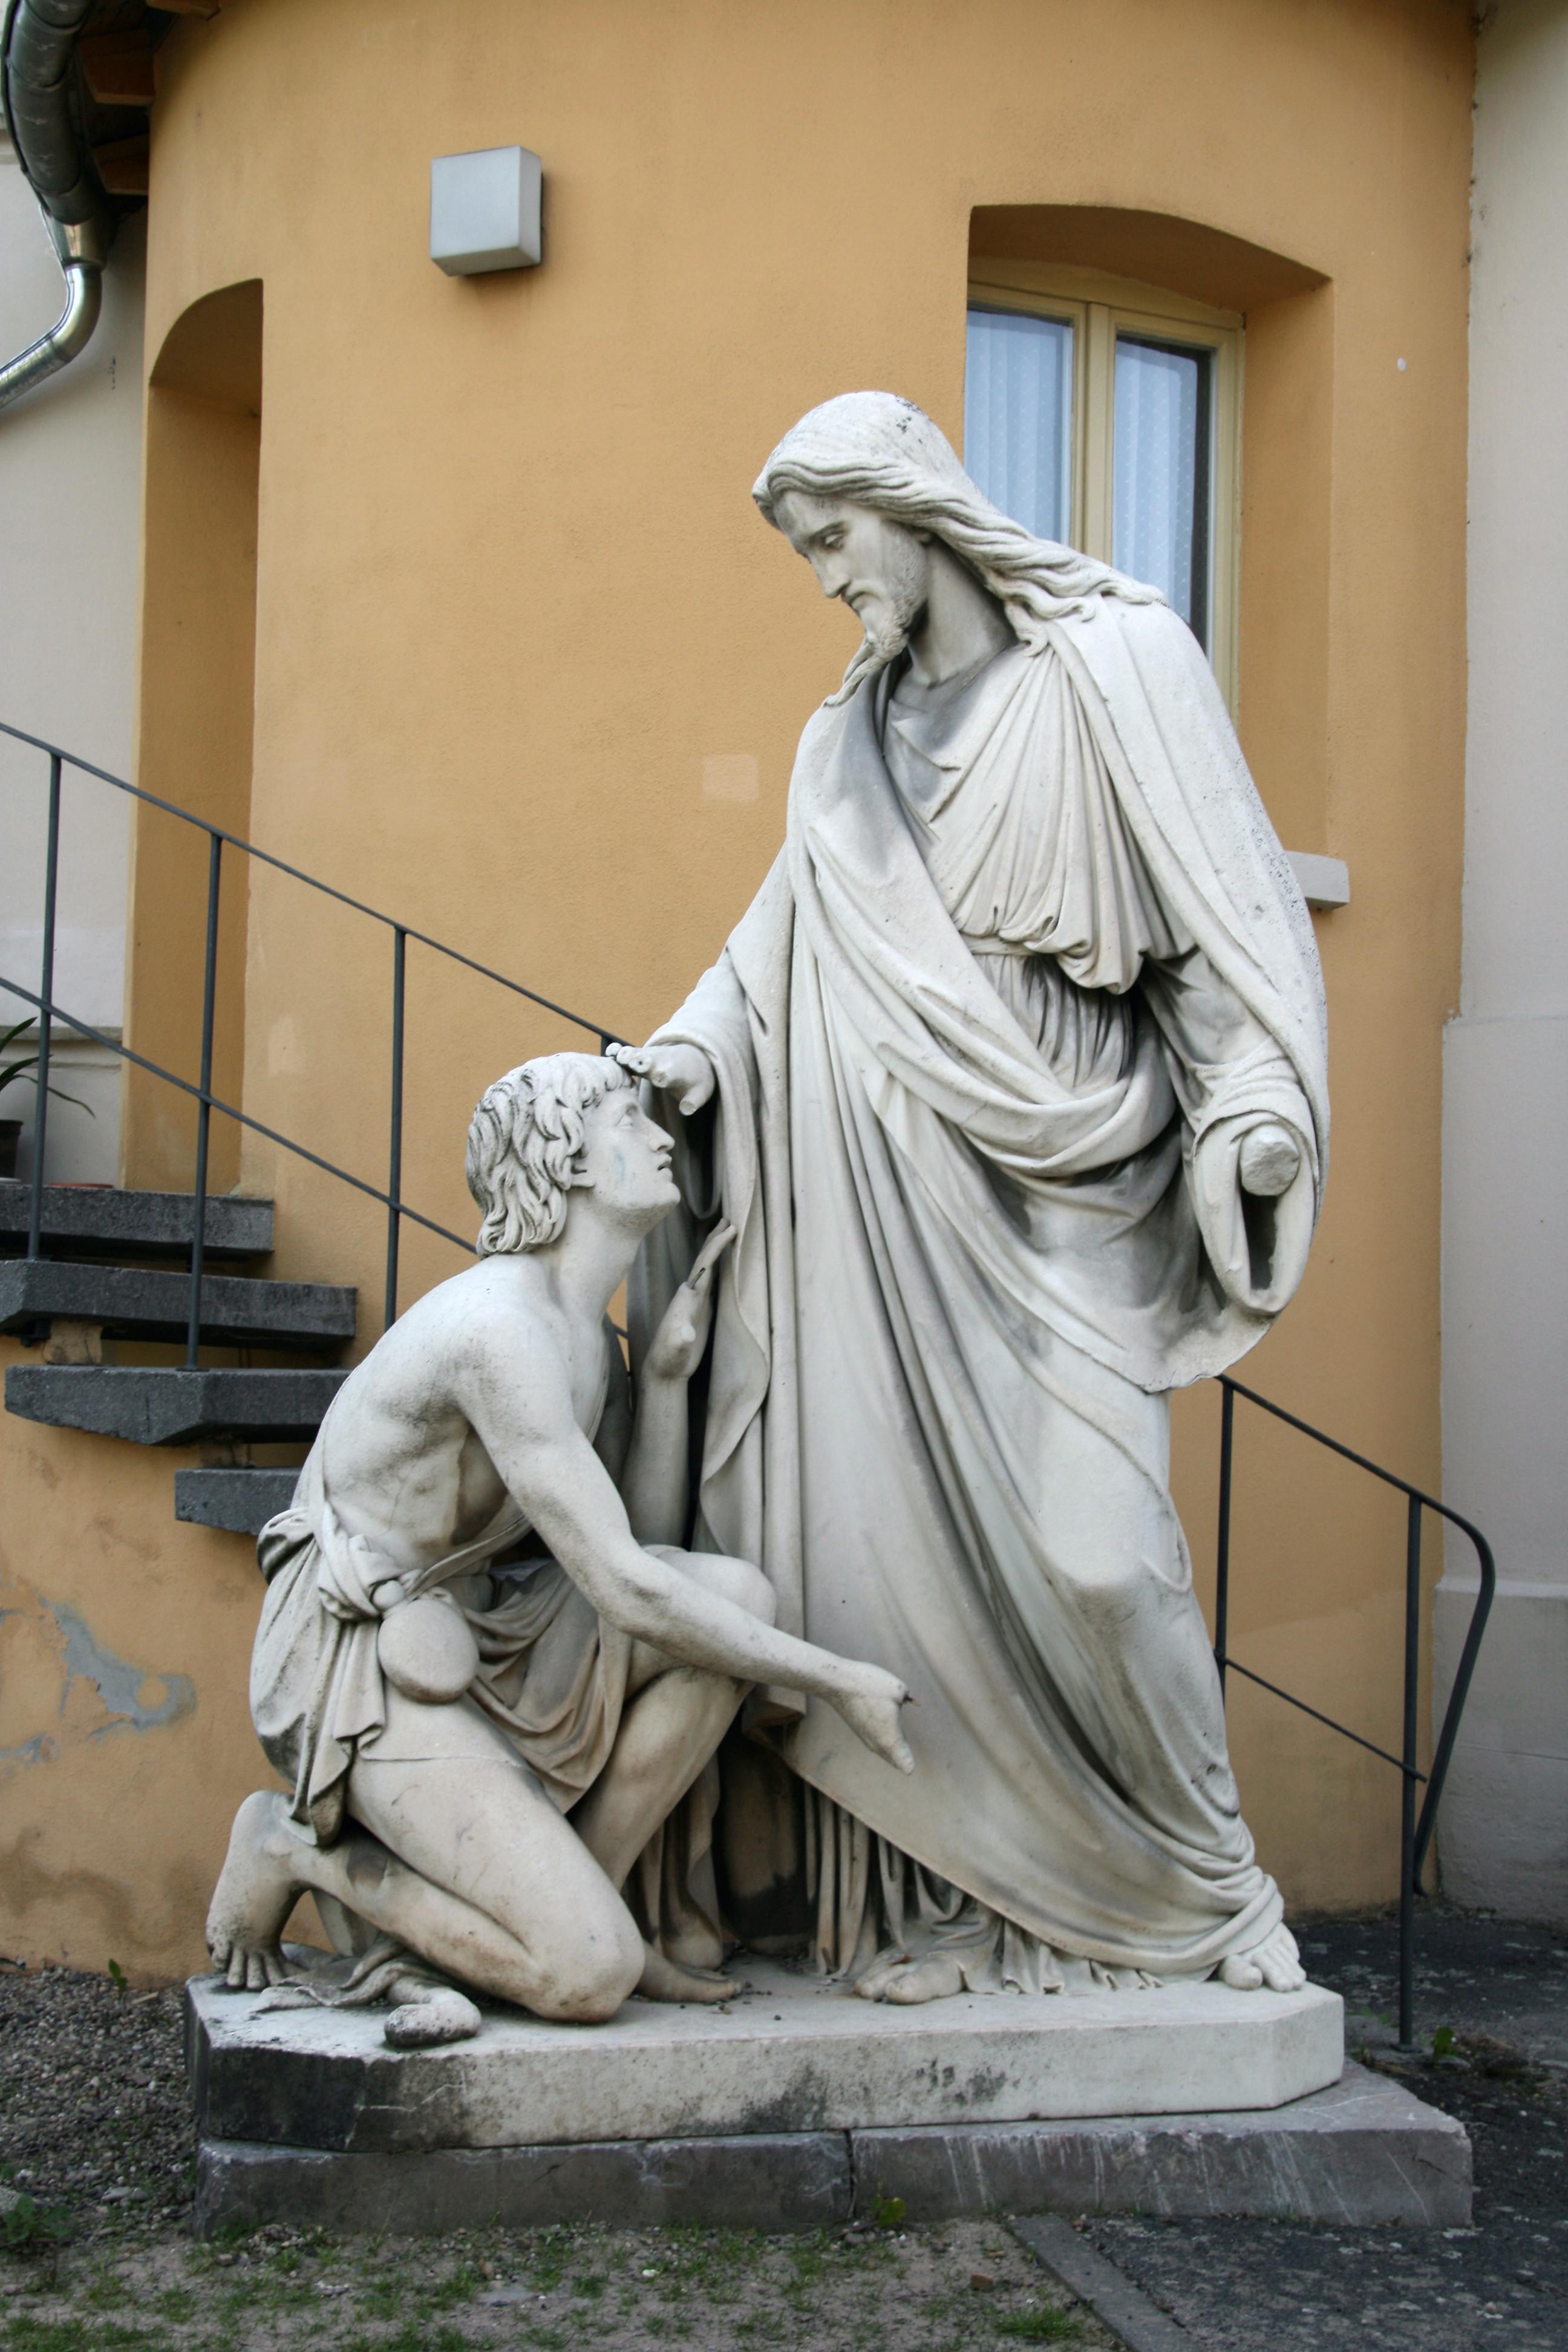 http://upload.wikimedia.org/wikipedia/commons/c/c8/Christus_Bartimaeus_Johann_Heinrich_Stoever_Erbach_Rheingau.JPG; Author: Halffitt